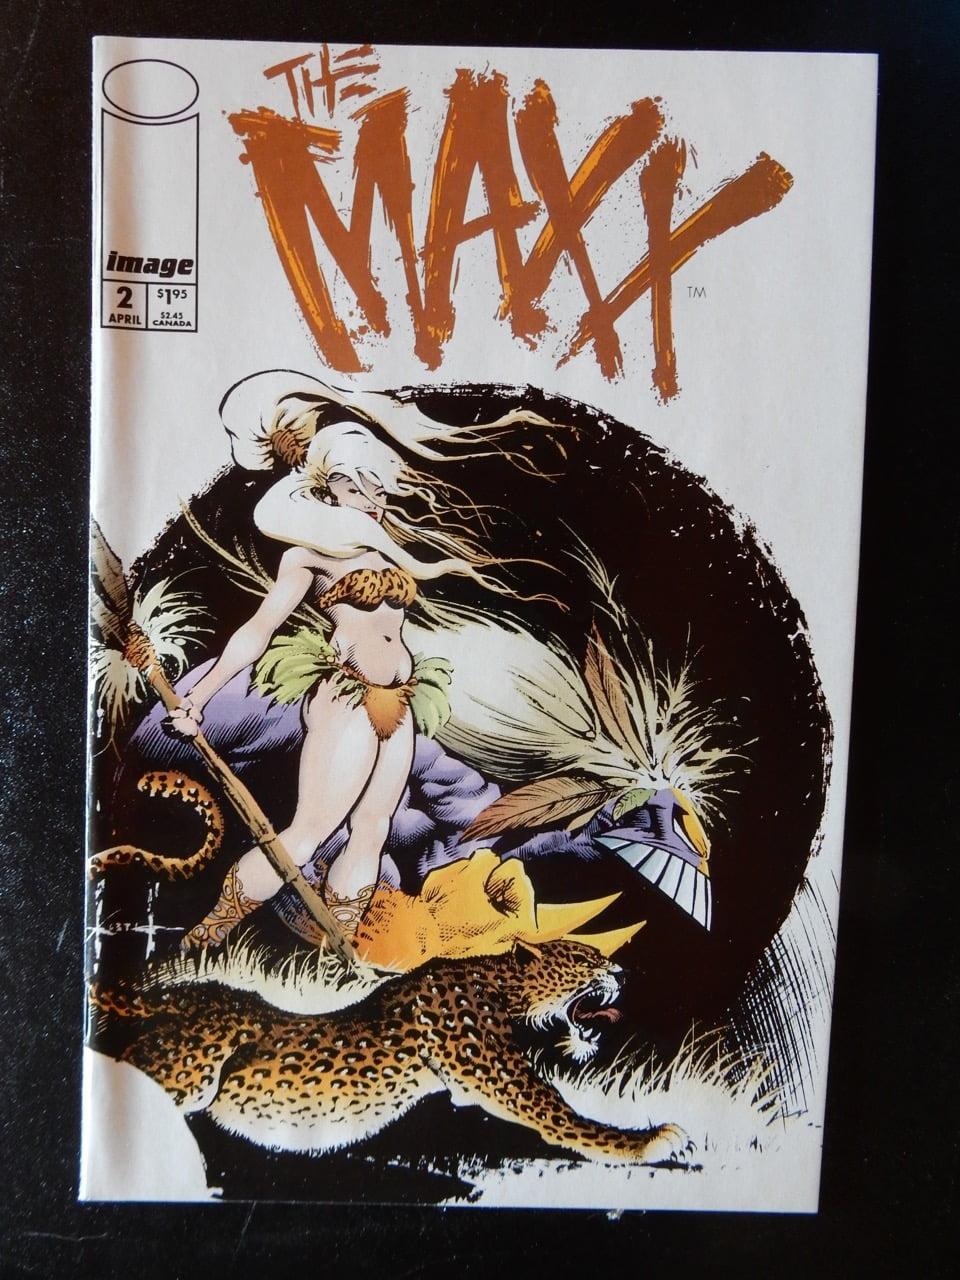 The Maxx #2 by Sam Keith